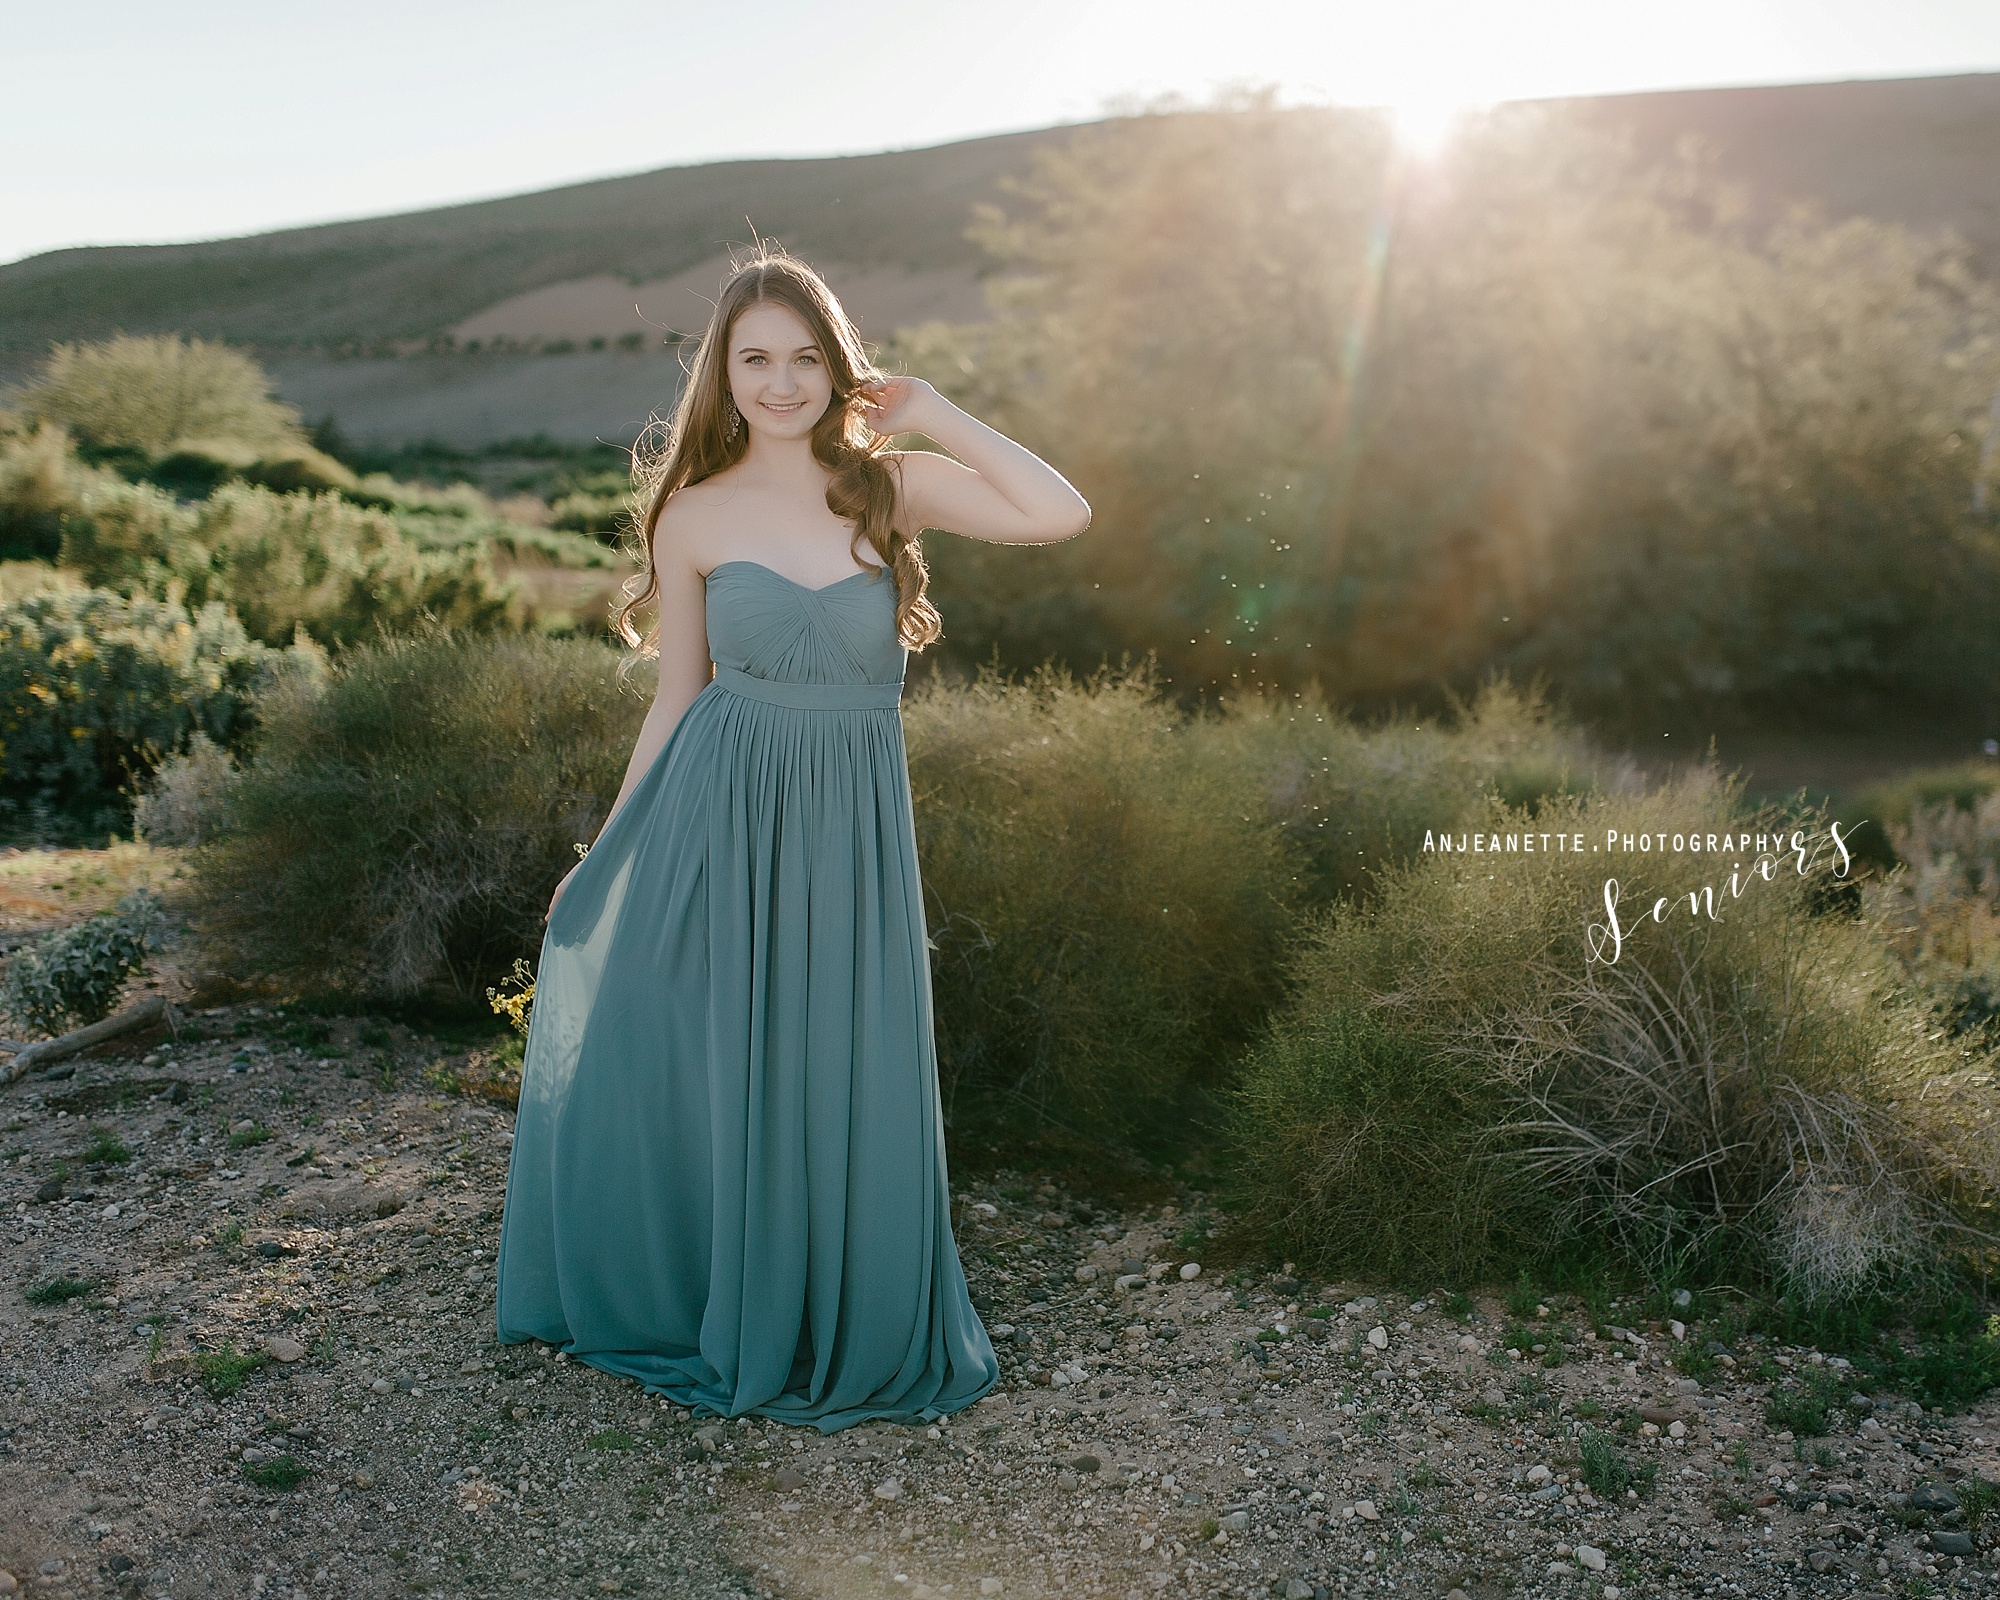 Arizona prom dress pageant Peoria Az Anthem Glendale Az beauty portrait photographer Anjeanette Photography Phoenix Evening Gown Photogenic model scottsdale